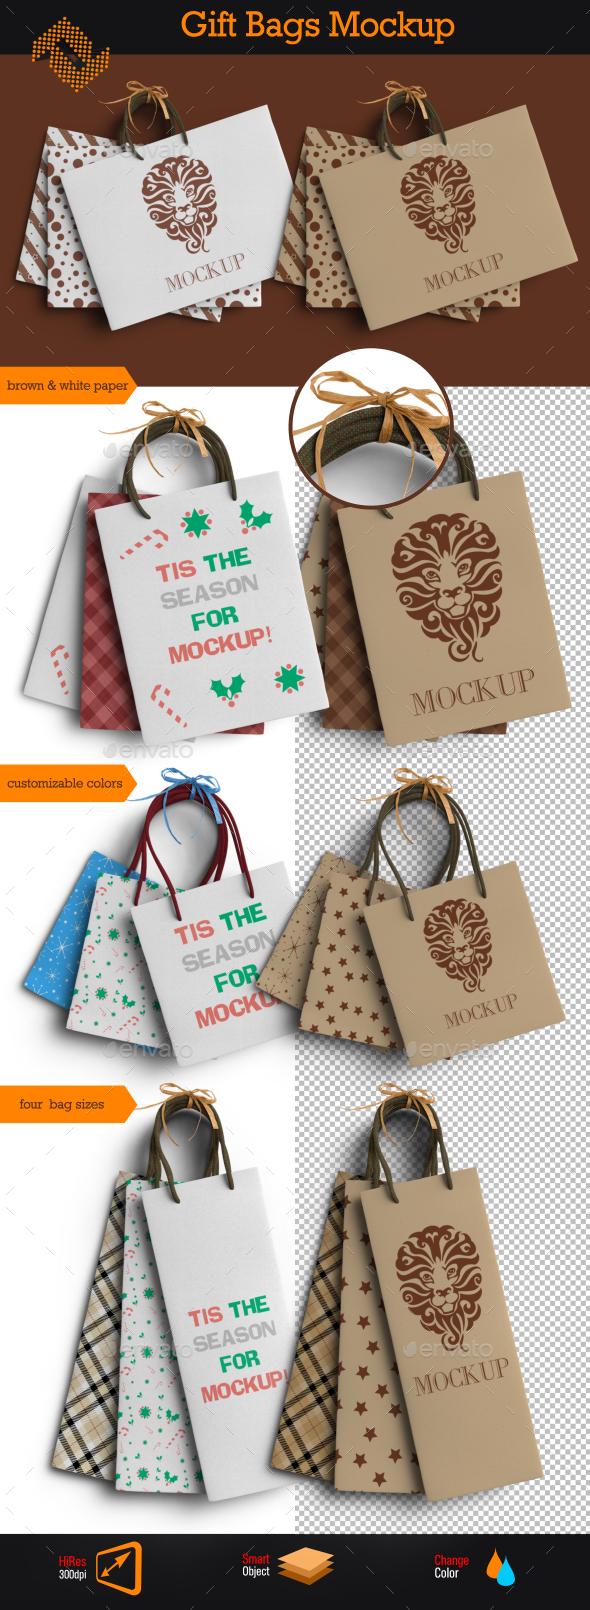 GraphicRiver Gift Bags Mockup 9692134